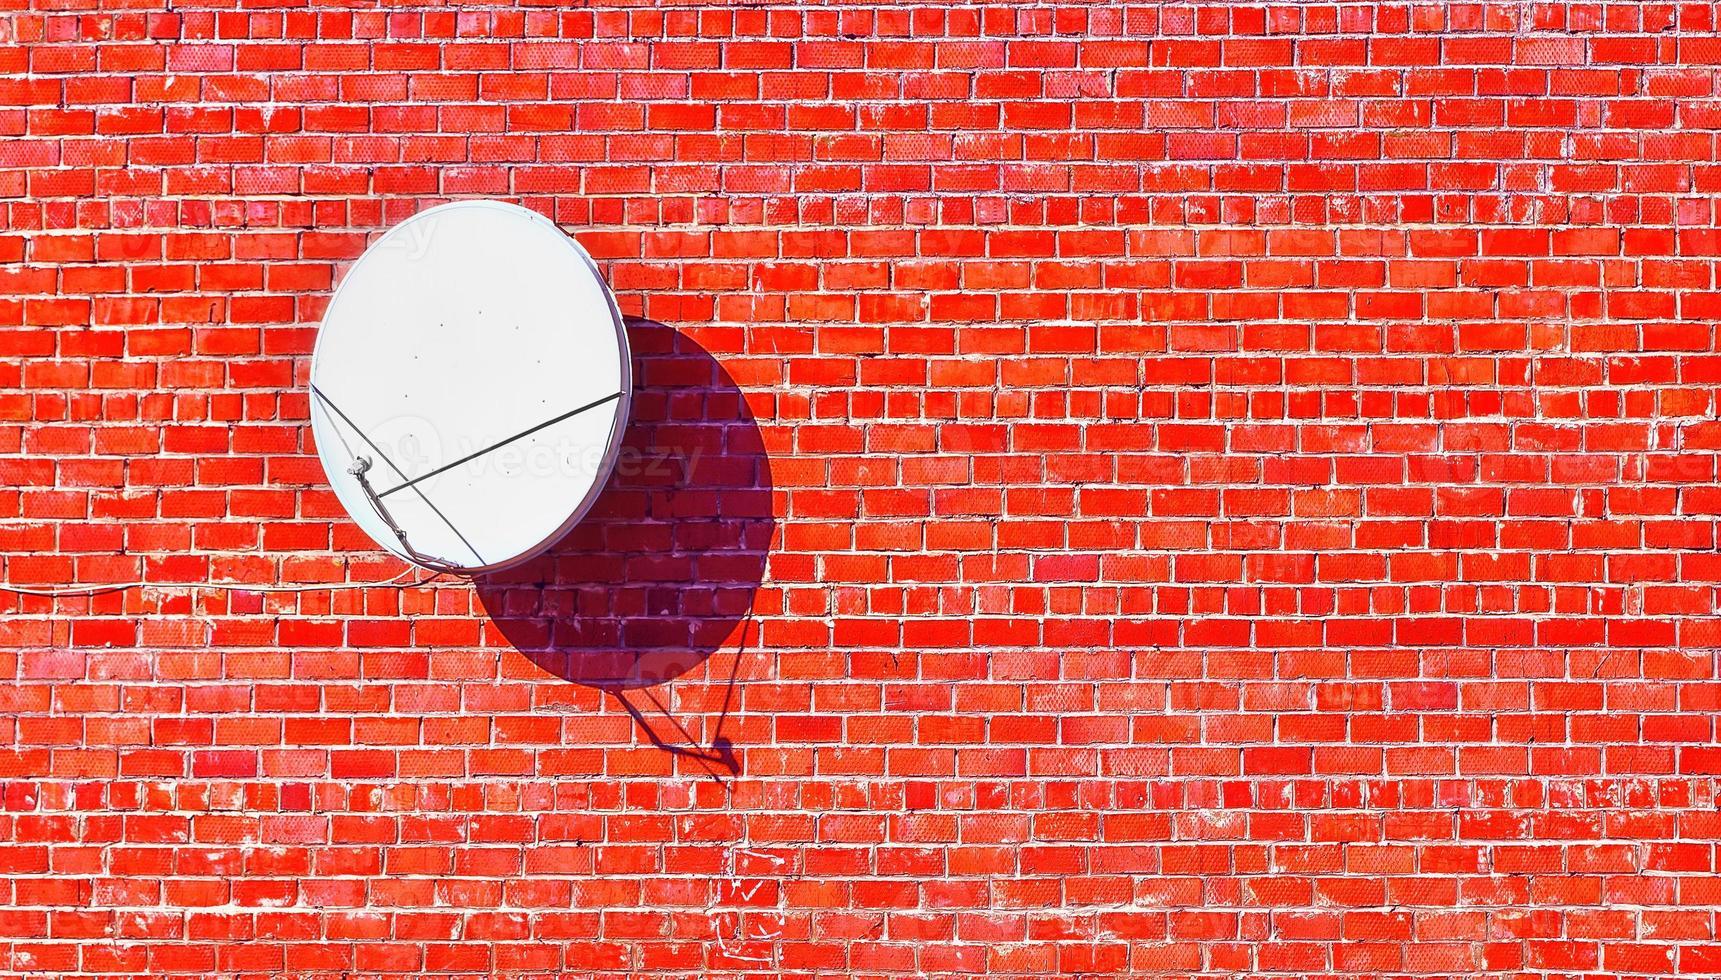 satellite dish red brick wall shadow photo